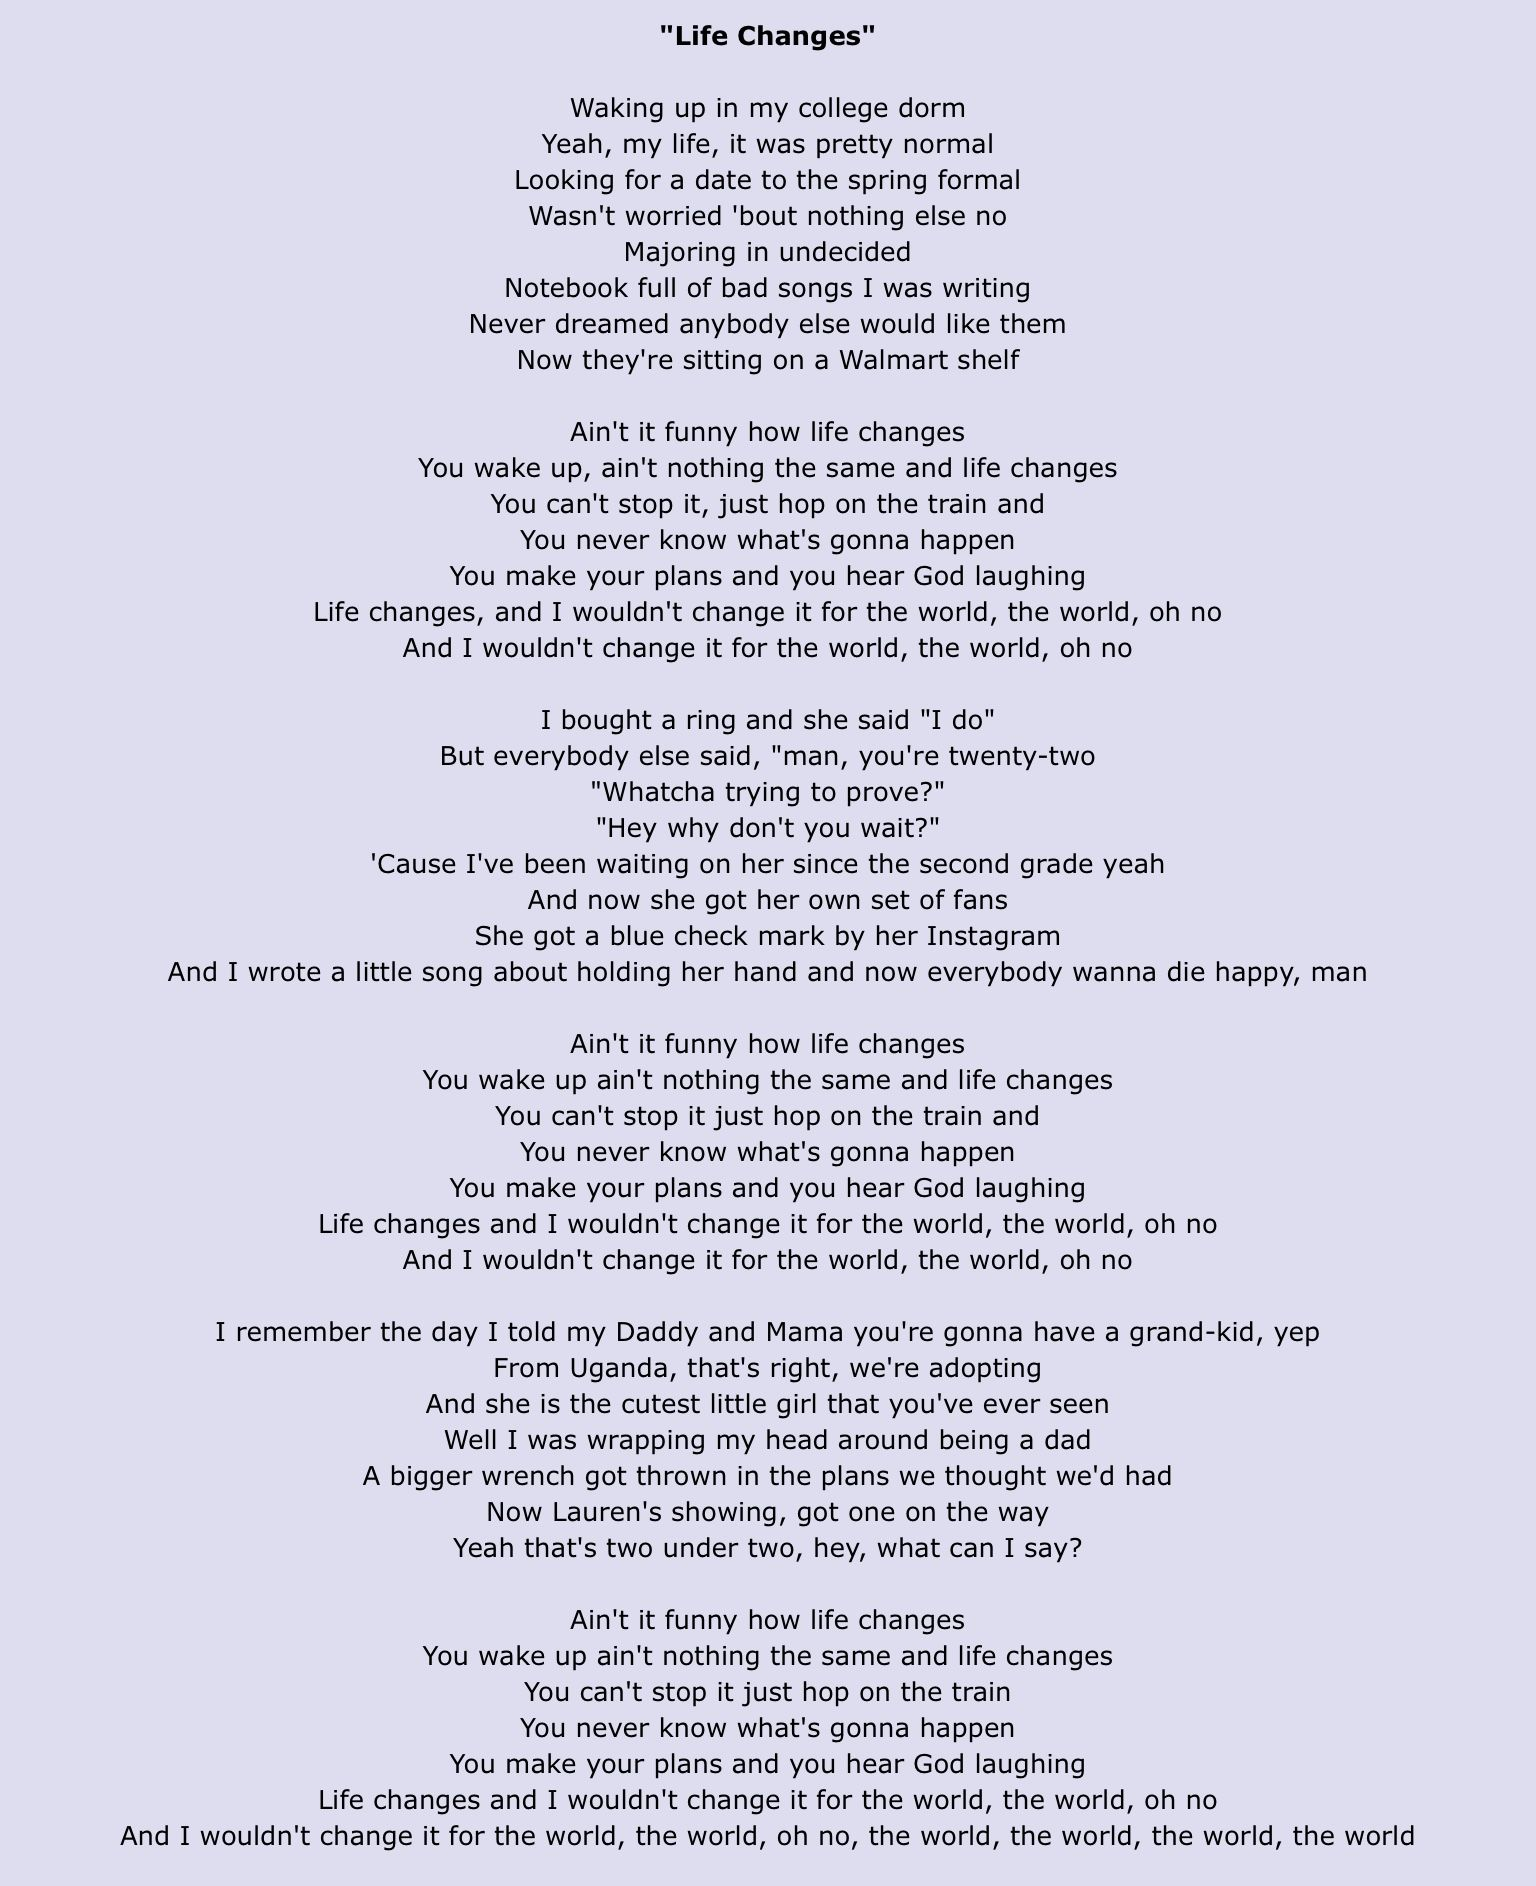 Life Changes By Thomas Rhett Country Lyrics Changes Lyrics Thomas Rhett Lyrics